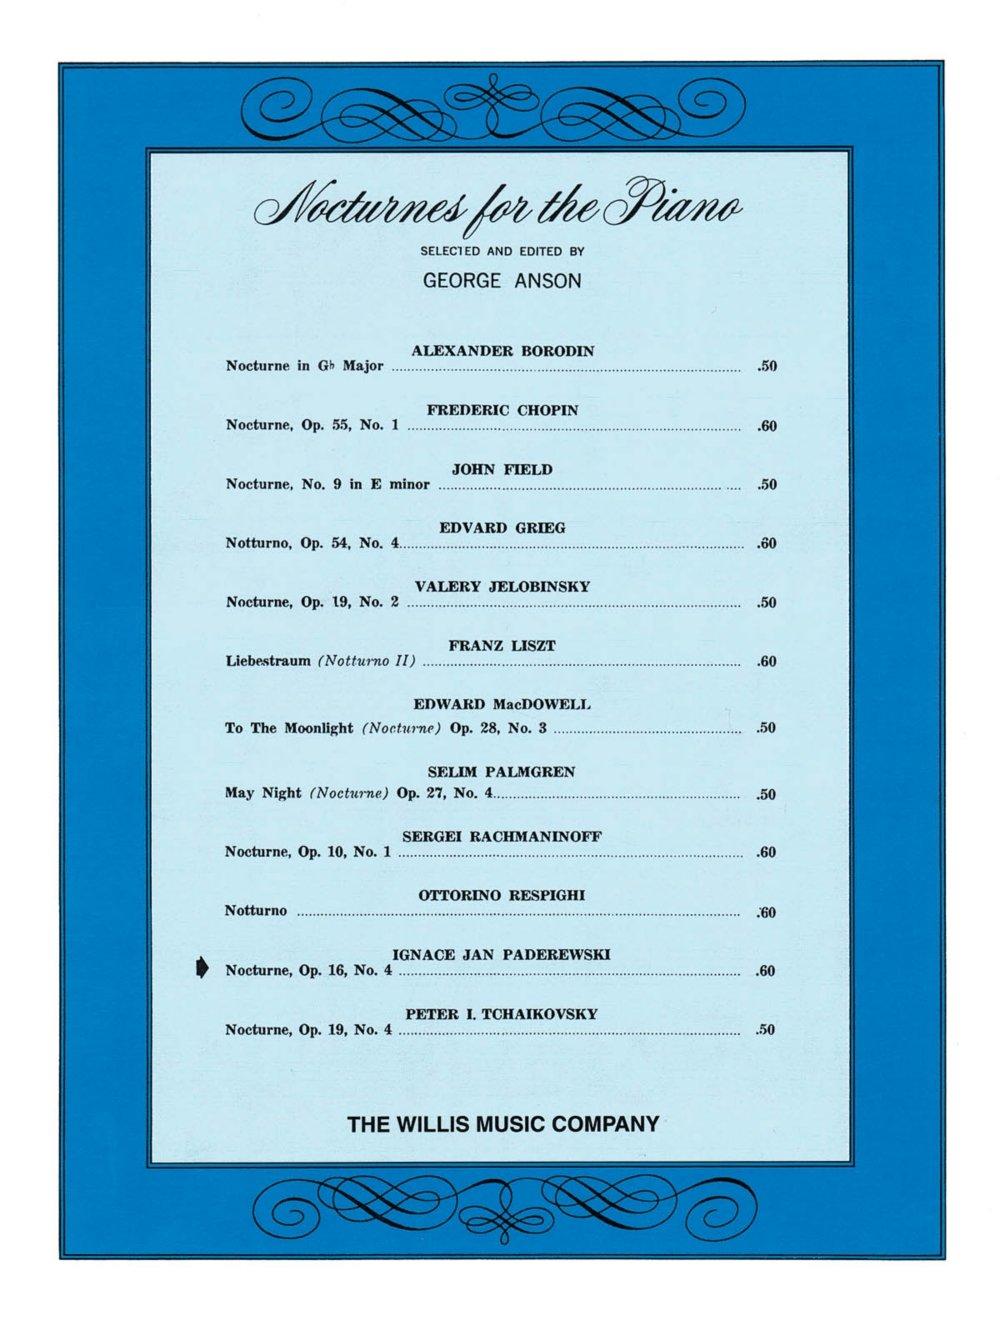 Download Willis Music Nocturne, Op. 16, No. 4 (Later Inter) Willis Series by Ignacy Jan Paderewski PDF